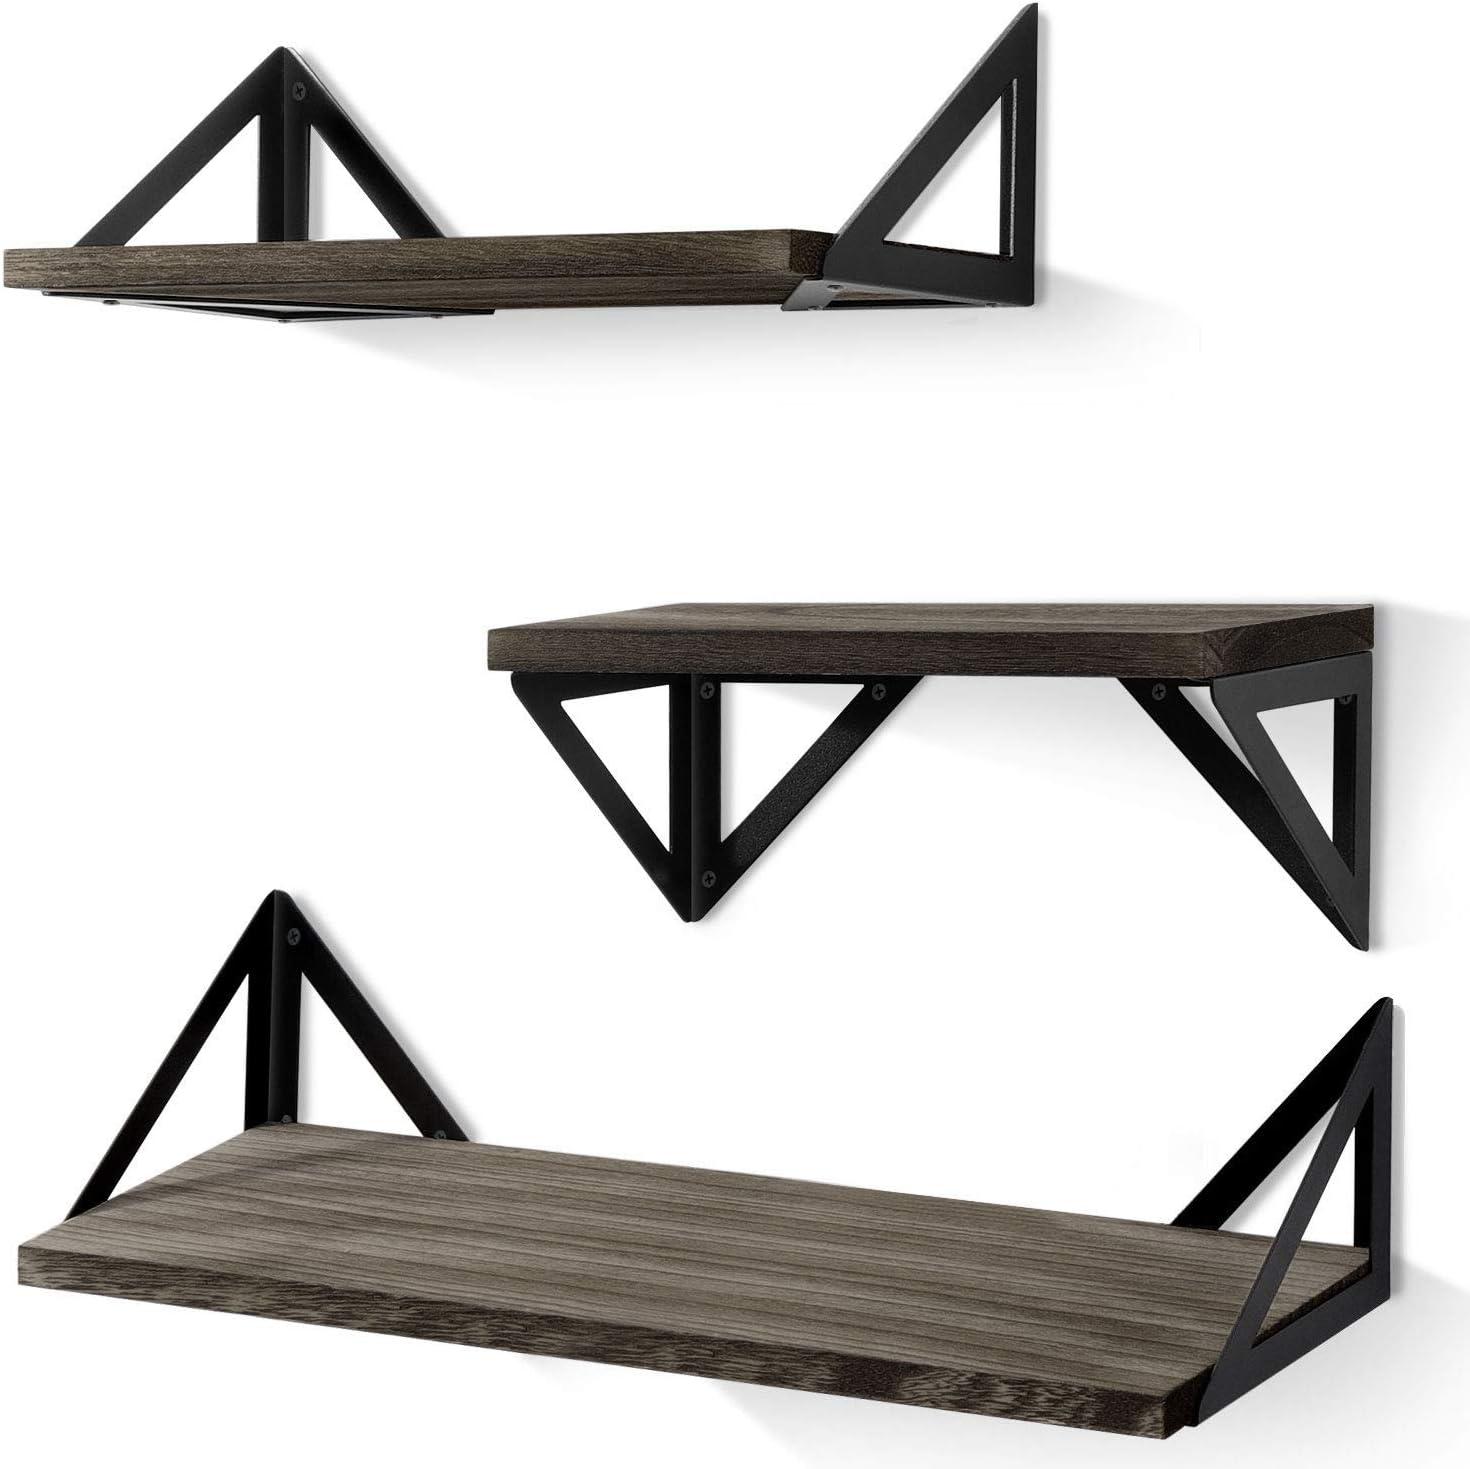 BAYKA Floating Shelves Wall Mounted, Rustic Wood Wall Shelves Set of 3 for Bedroom, Bathroom, Living Room, Kitchen (Grey)